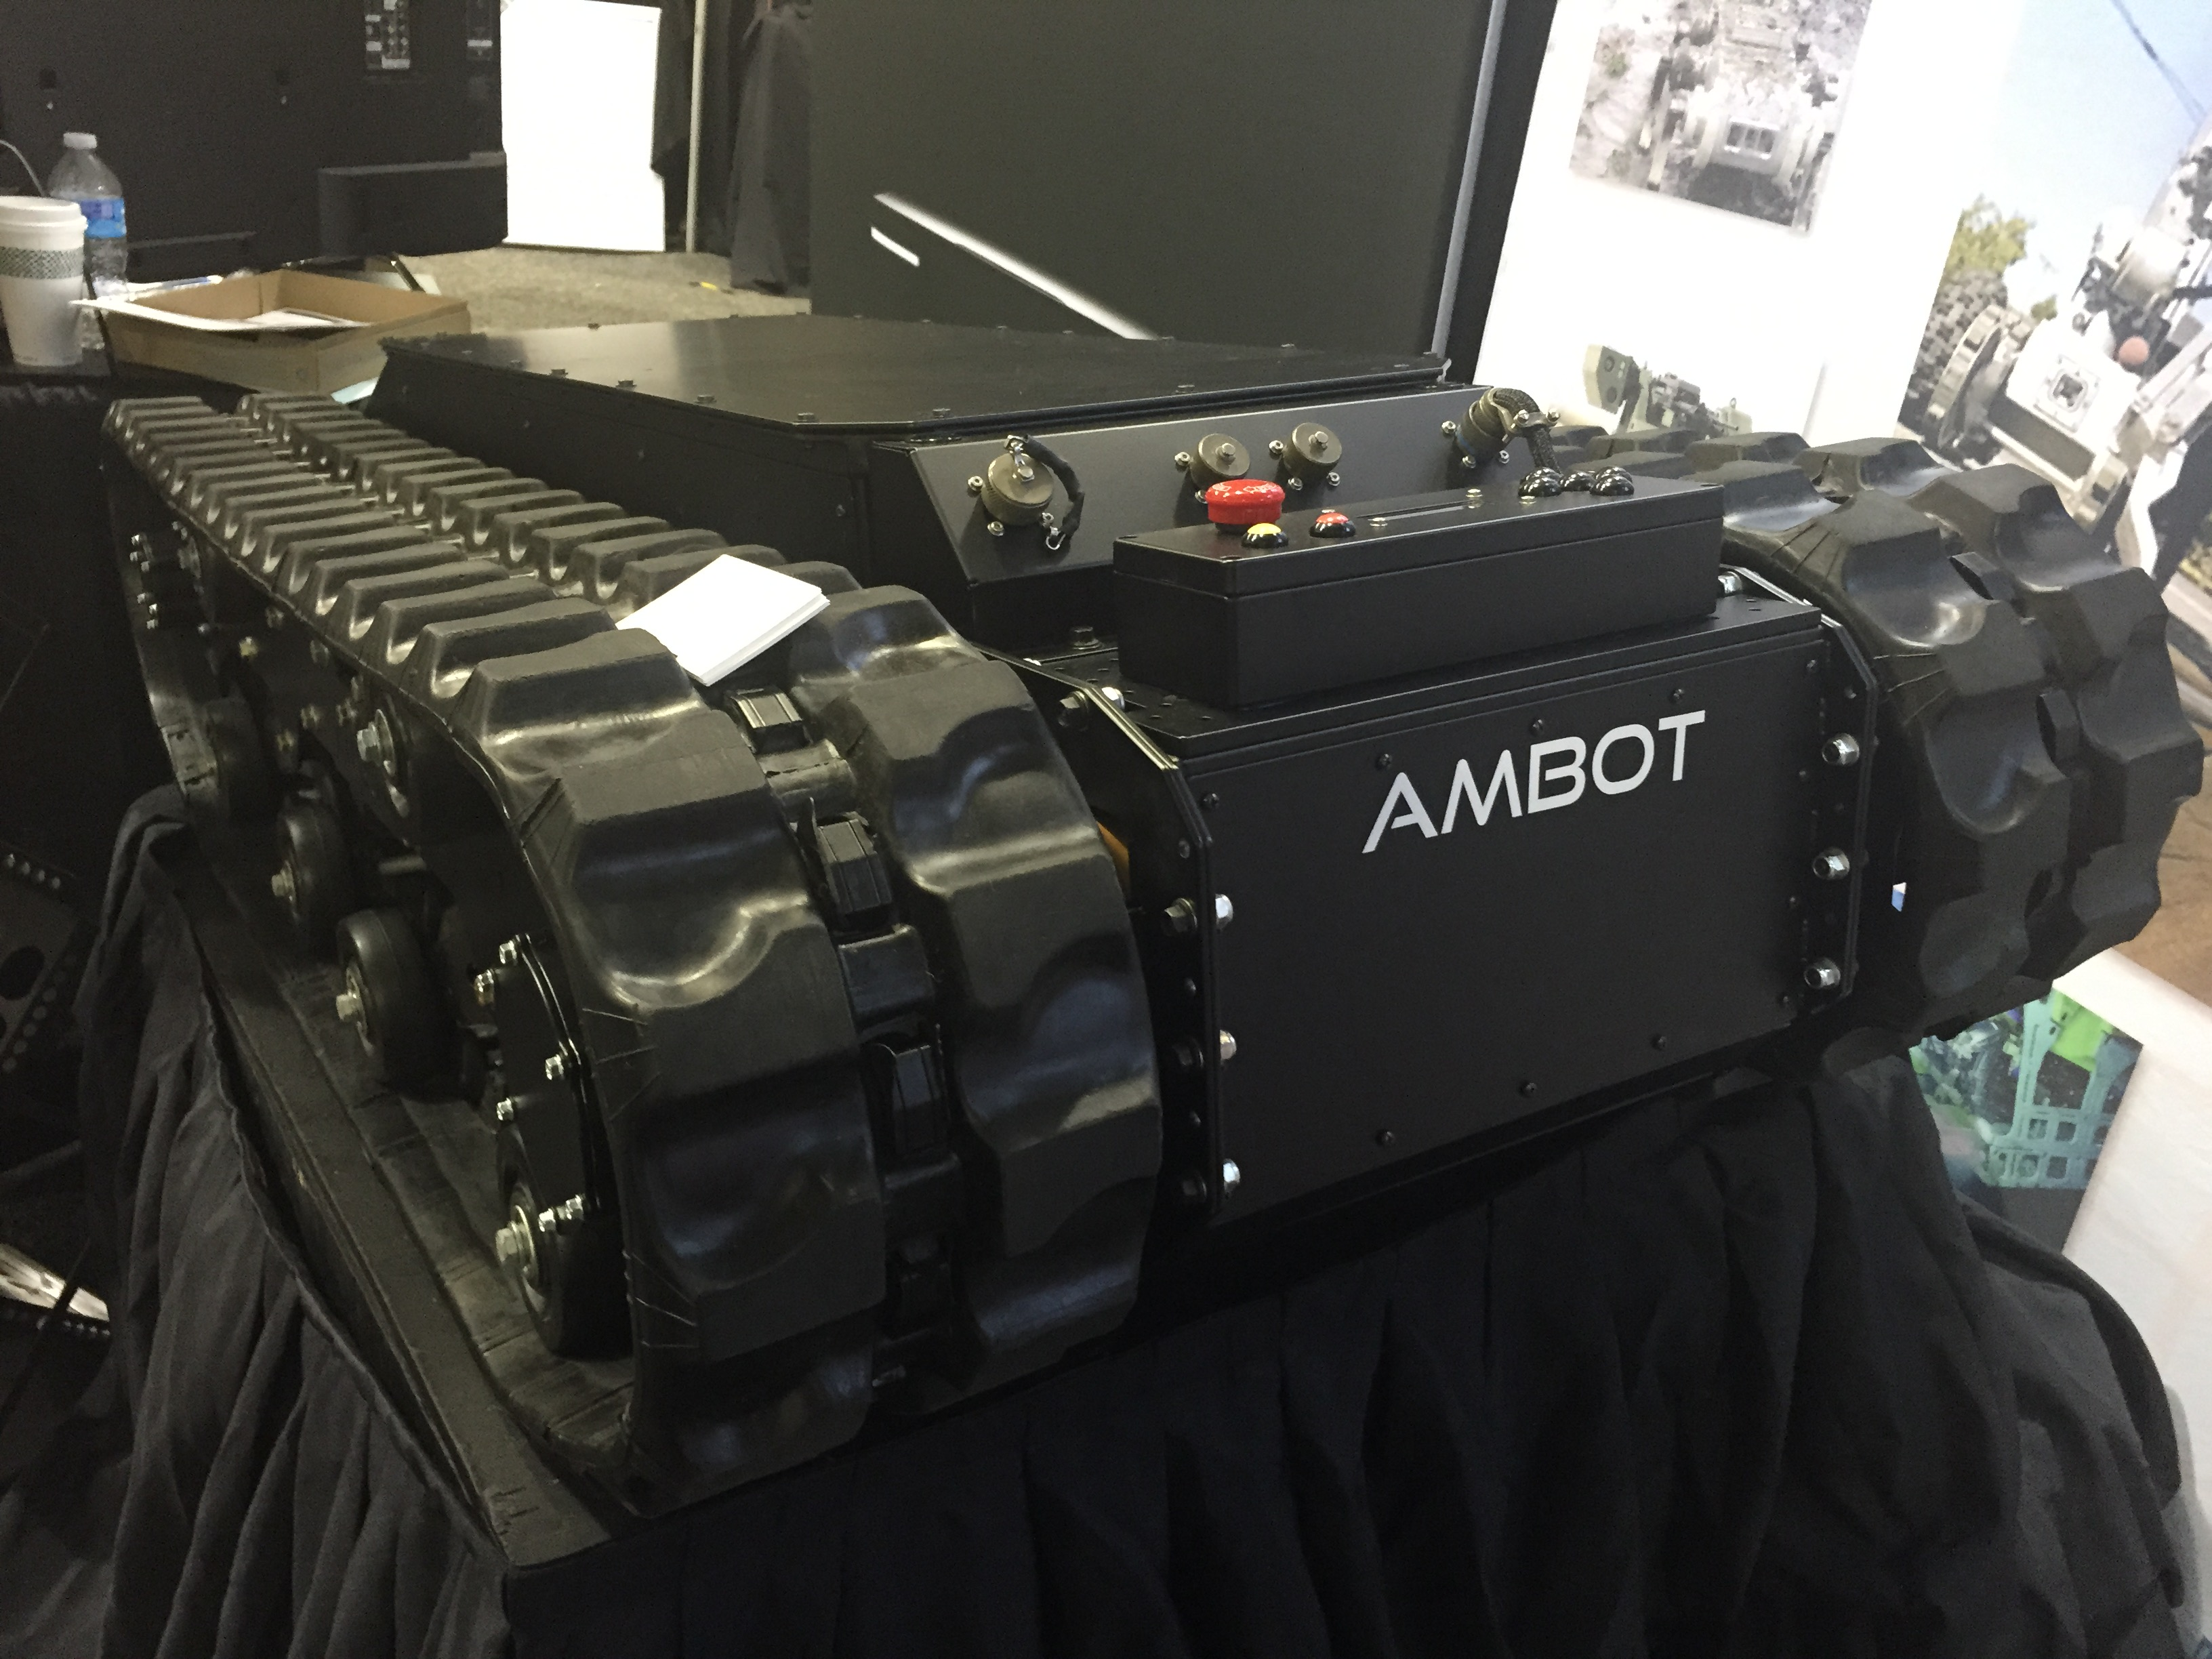 American Robot Company